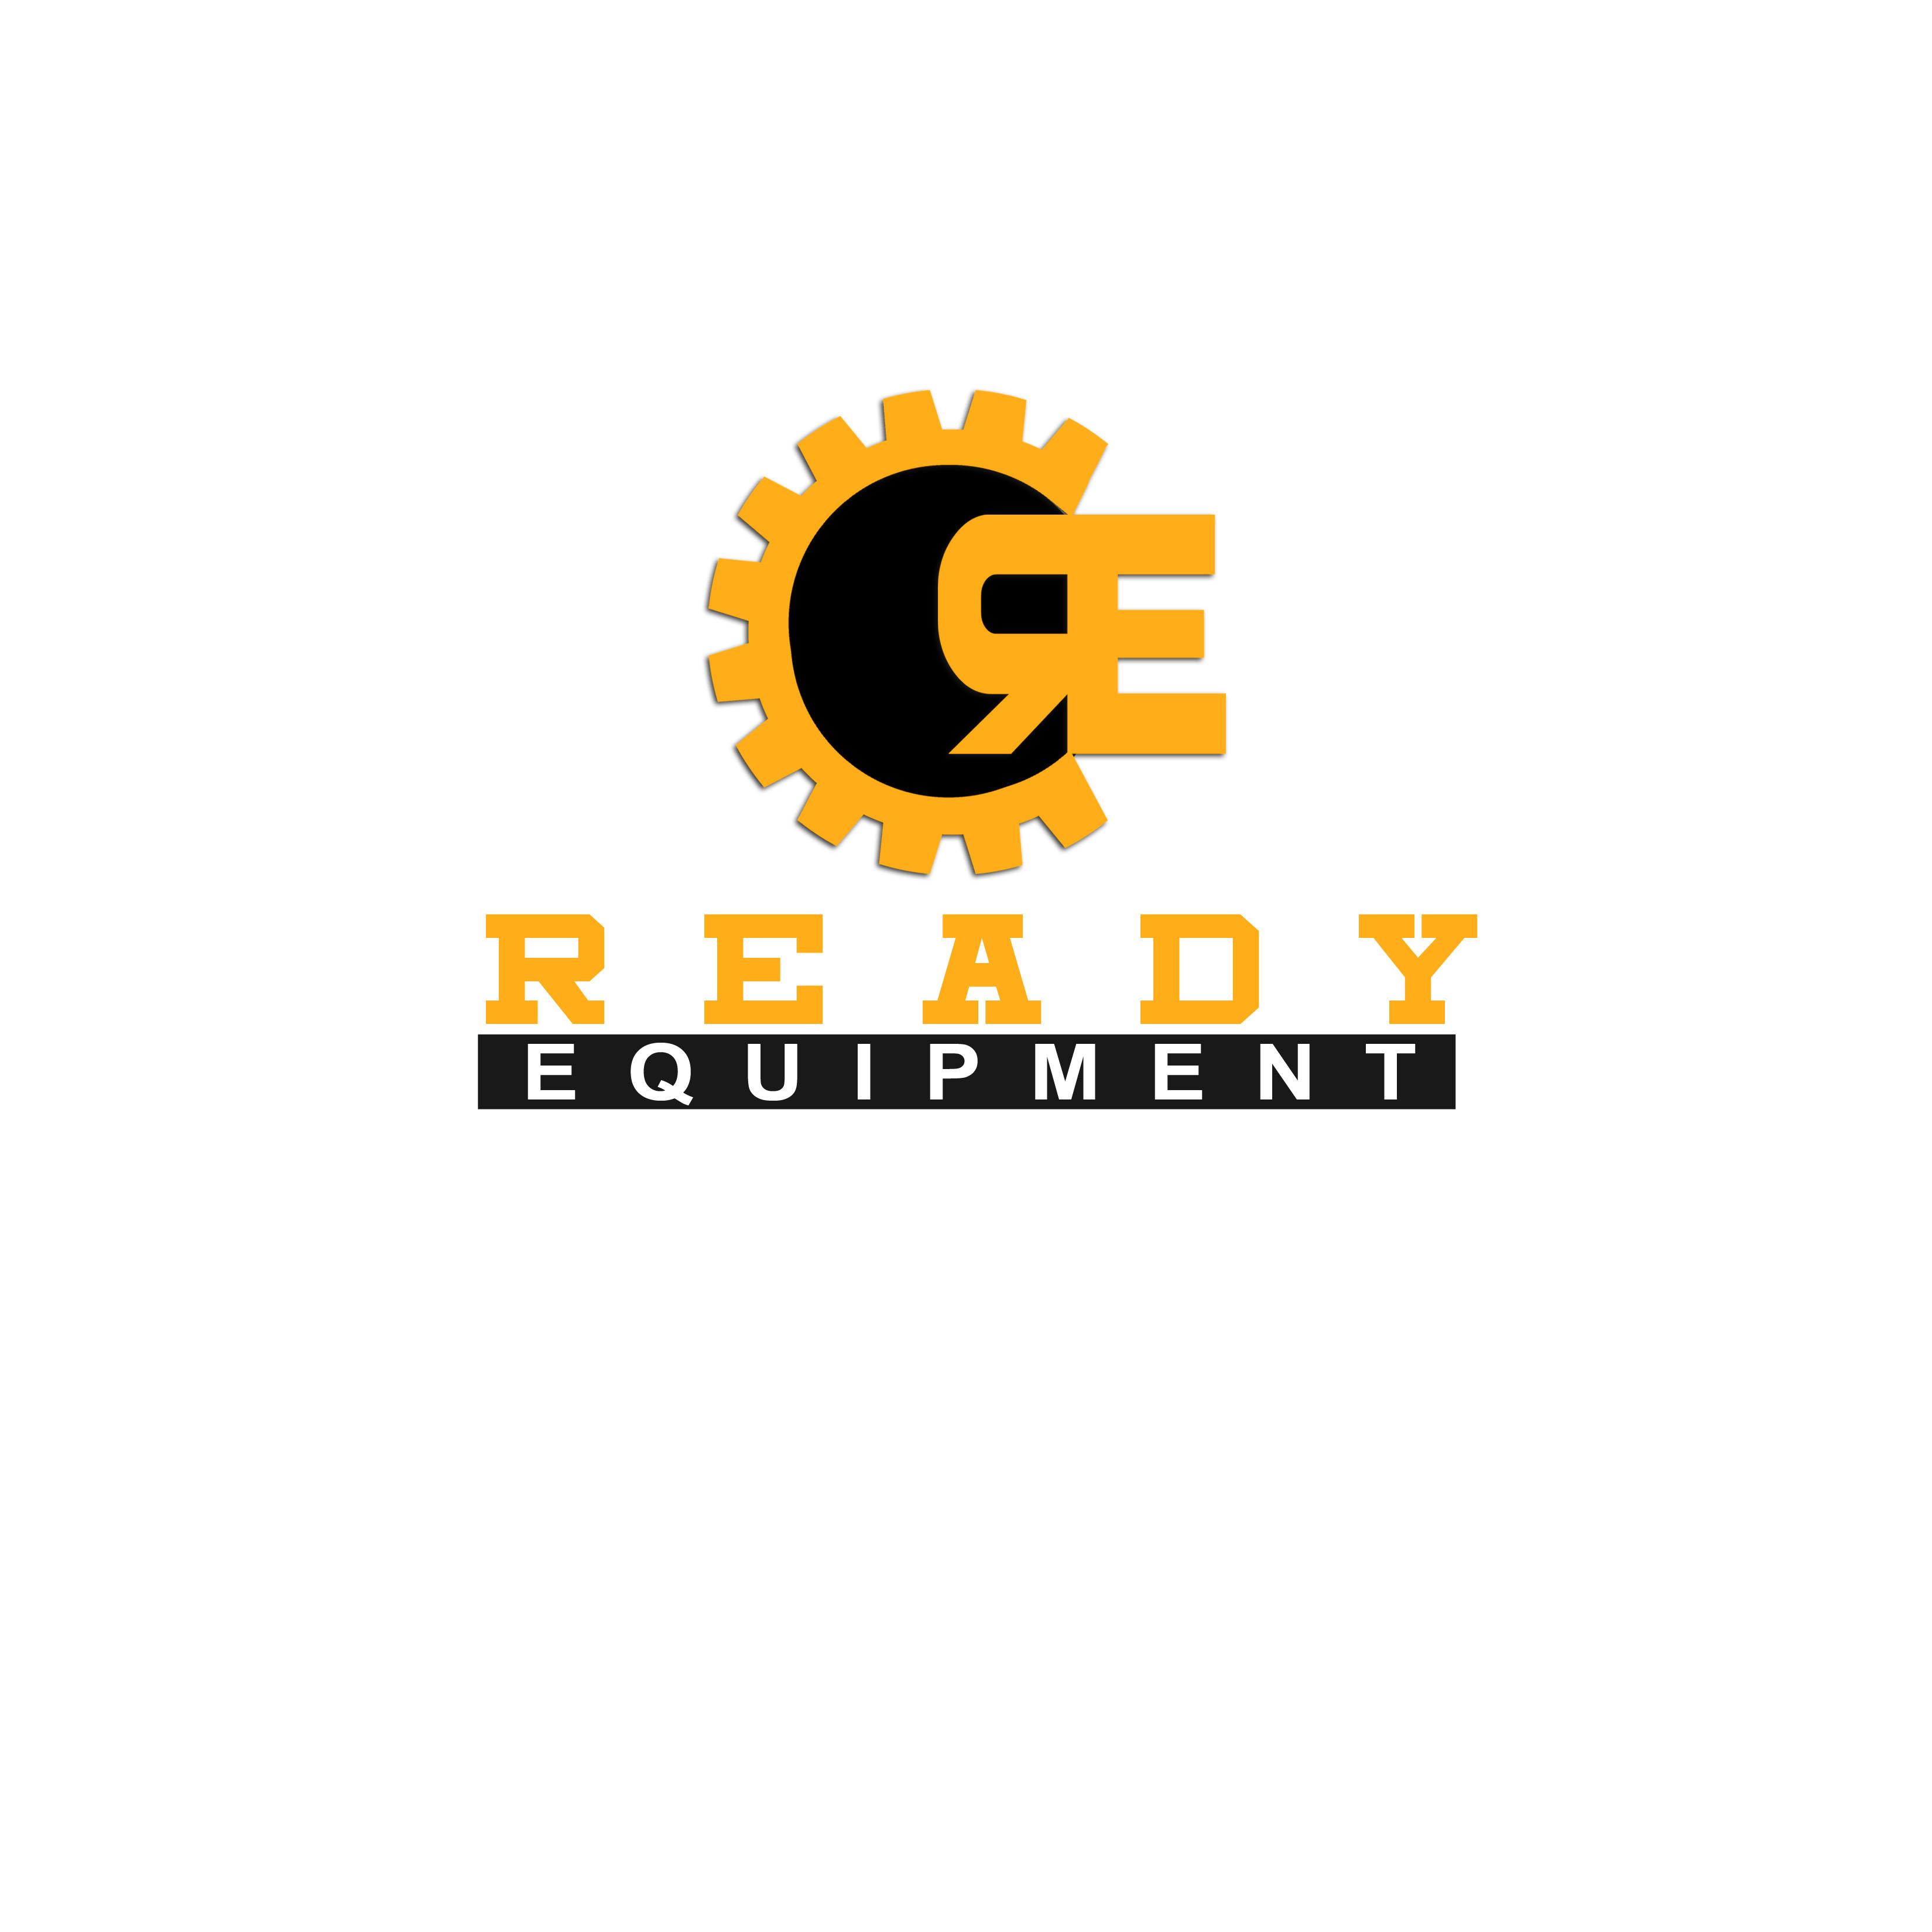 Logo Design by Allan Esclamado - Entry No. 145 in the Logo Design Contest Ready Equipment  Logo Design.